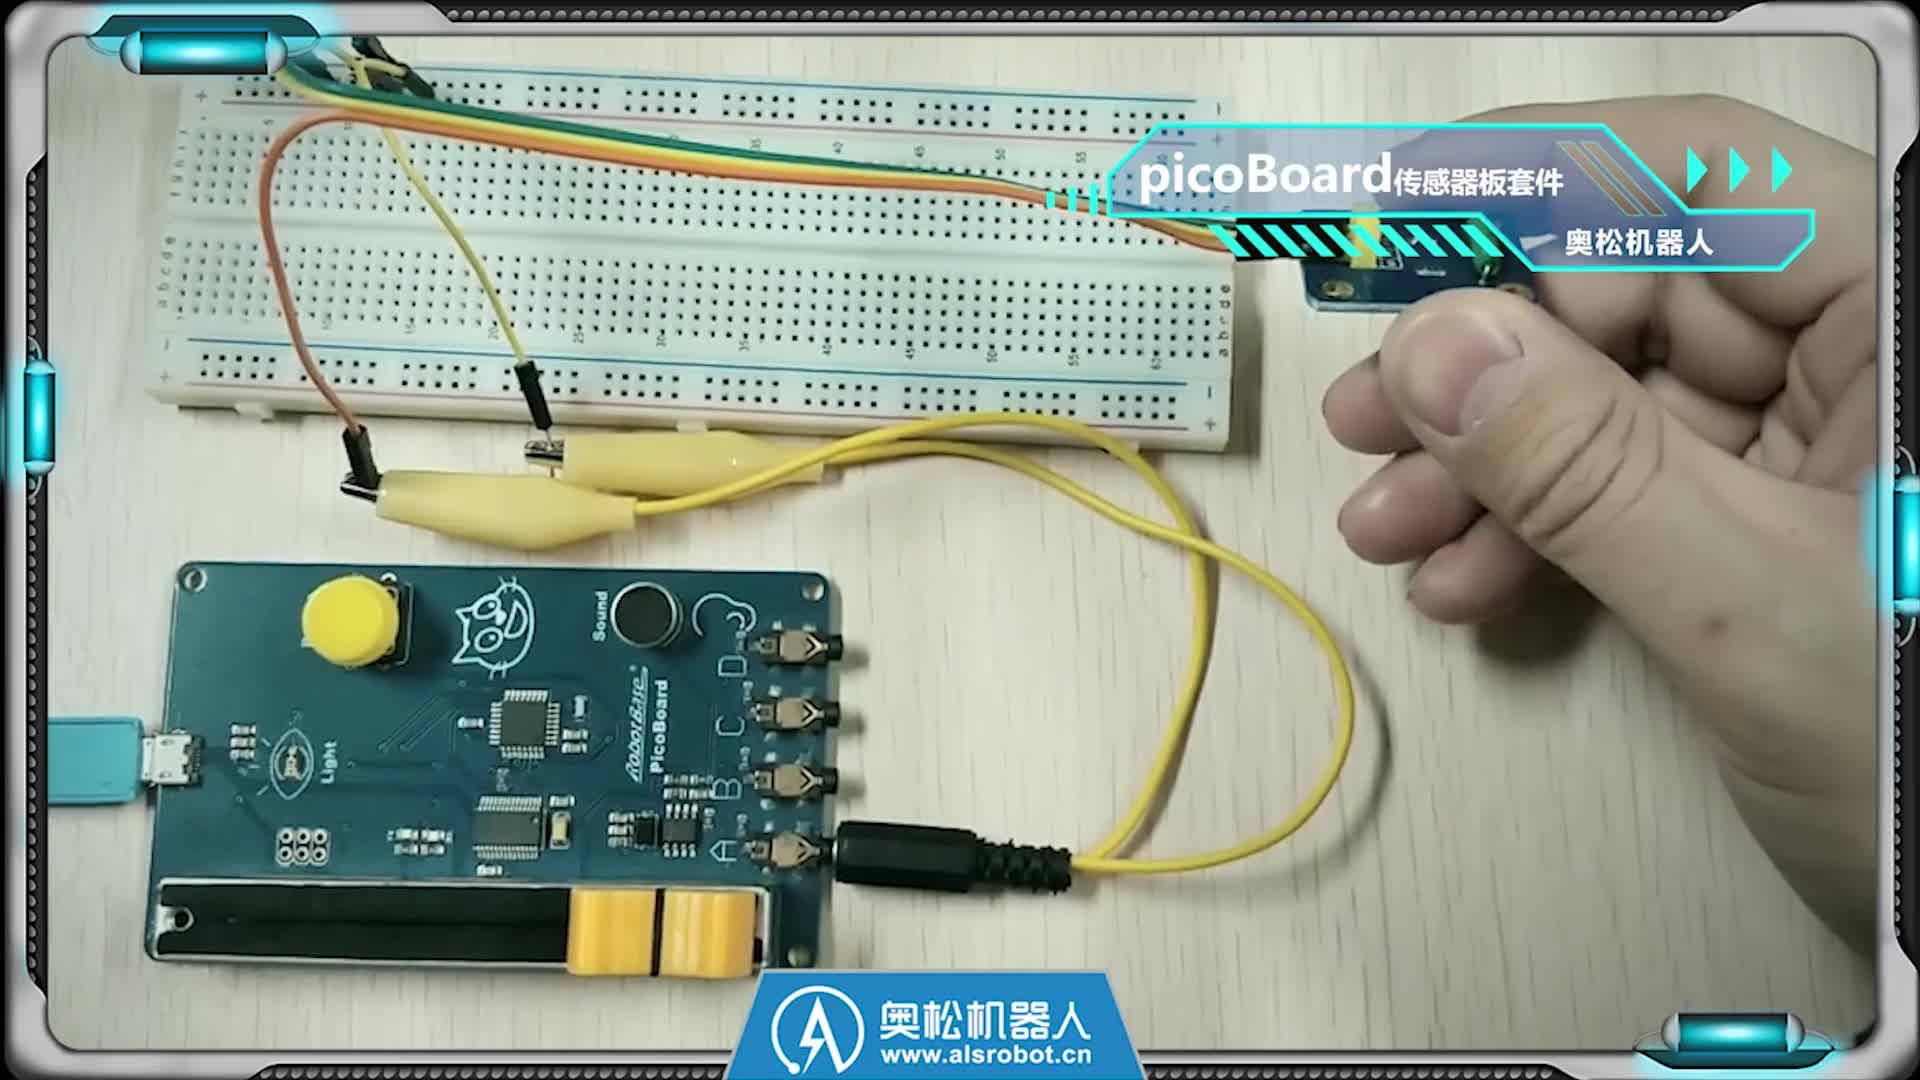 ALSRobot PicoBoard Scratch Programming Board PicoBoard Scratch Board